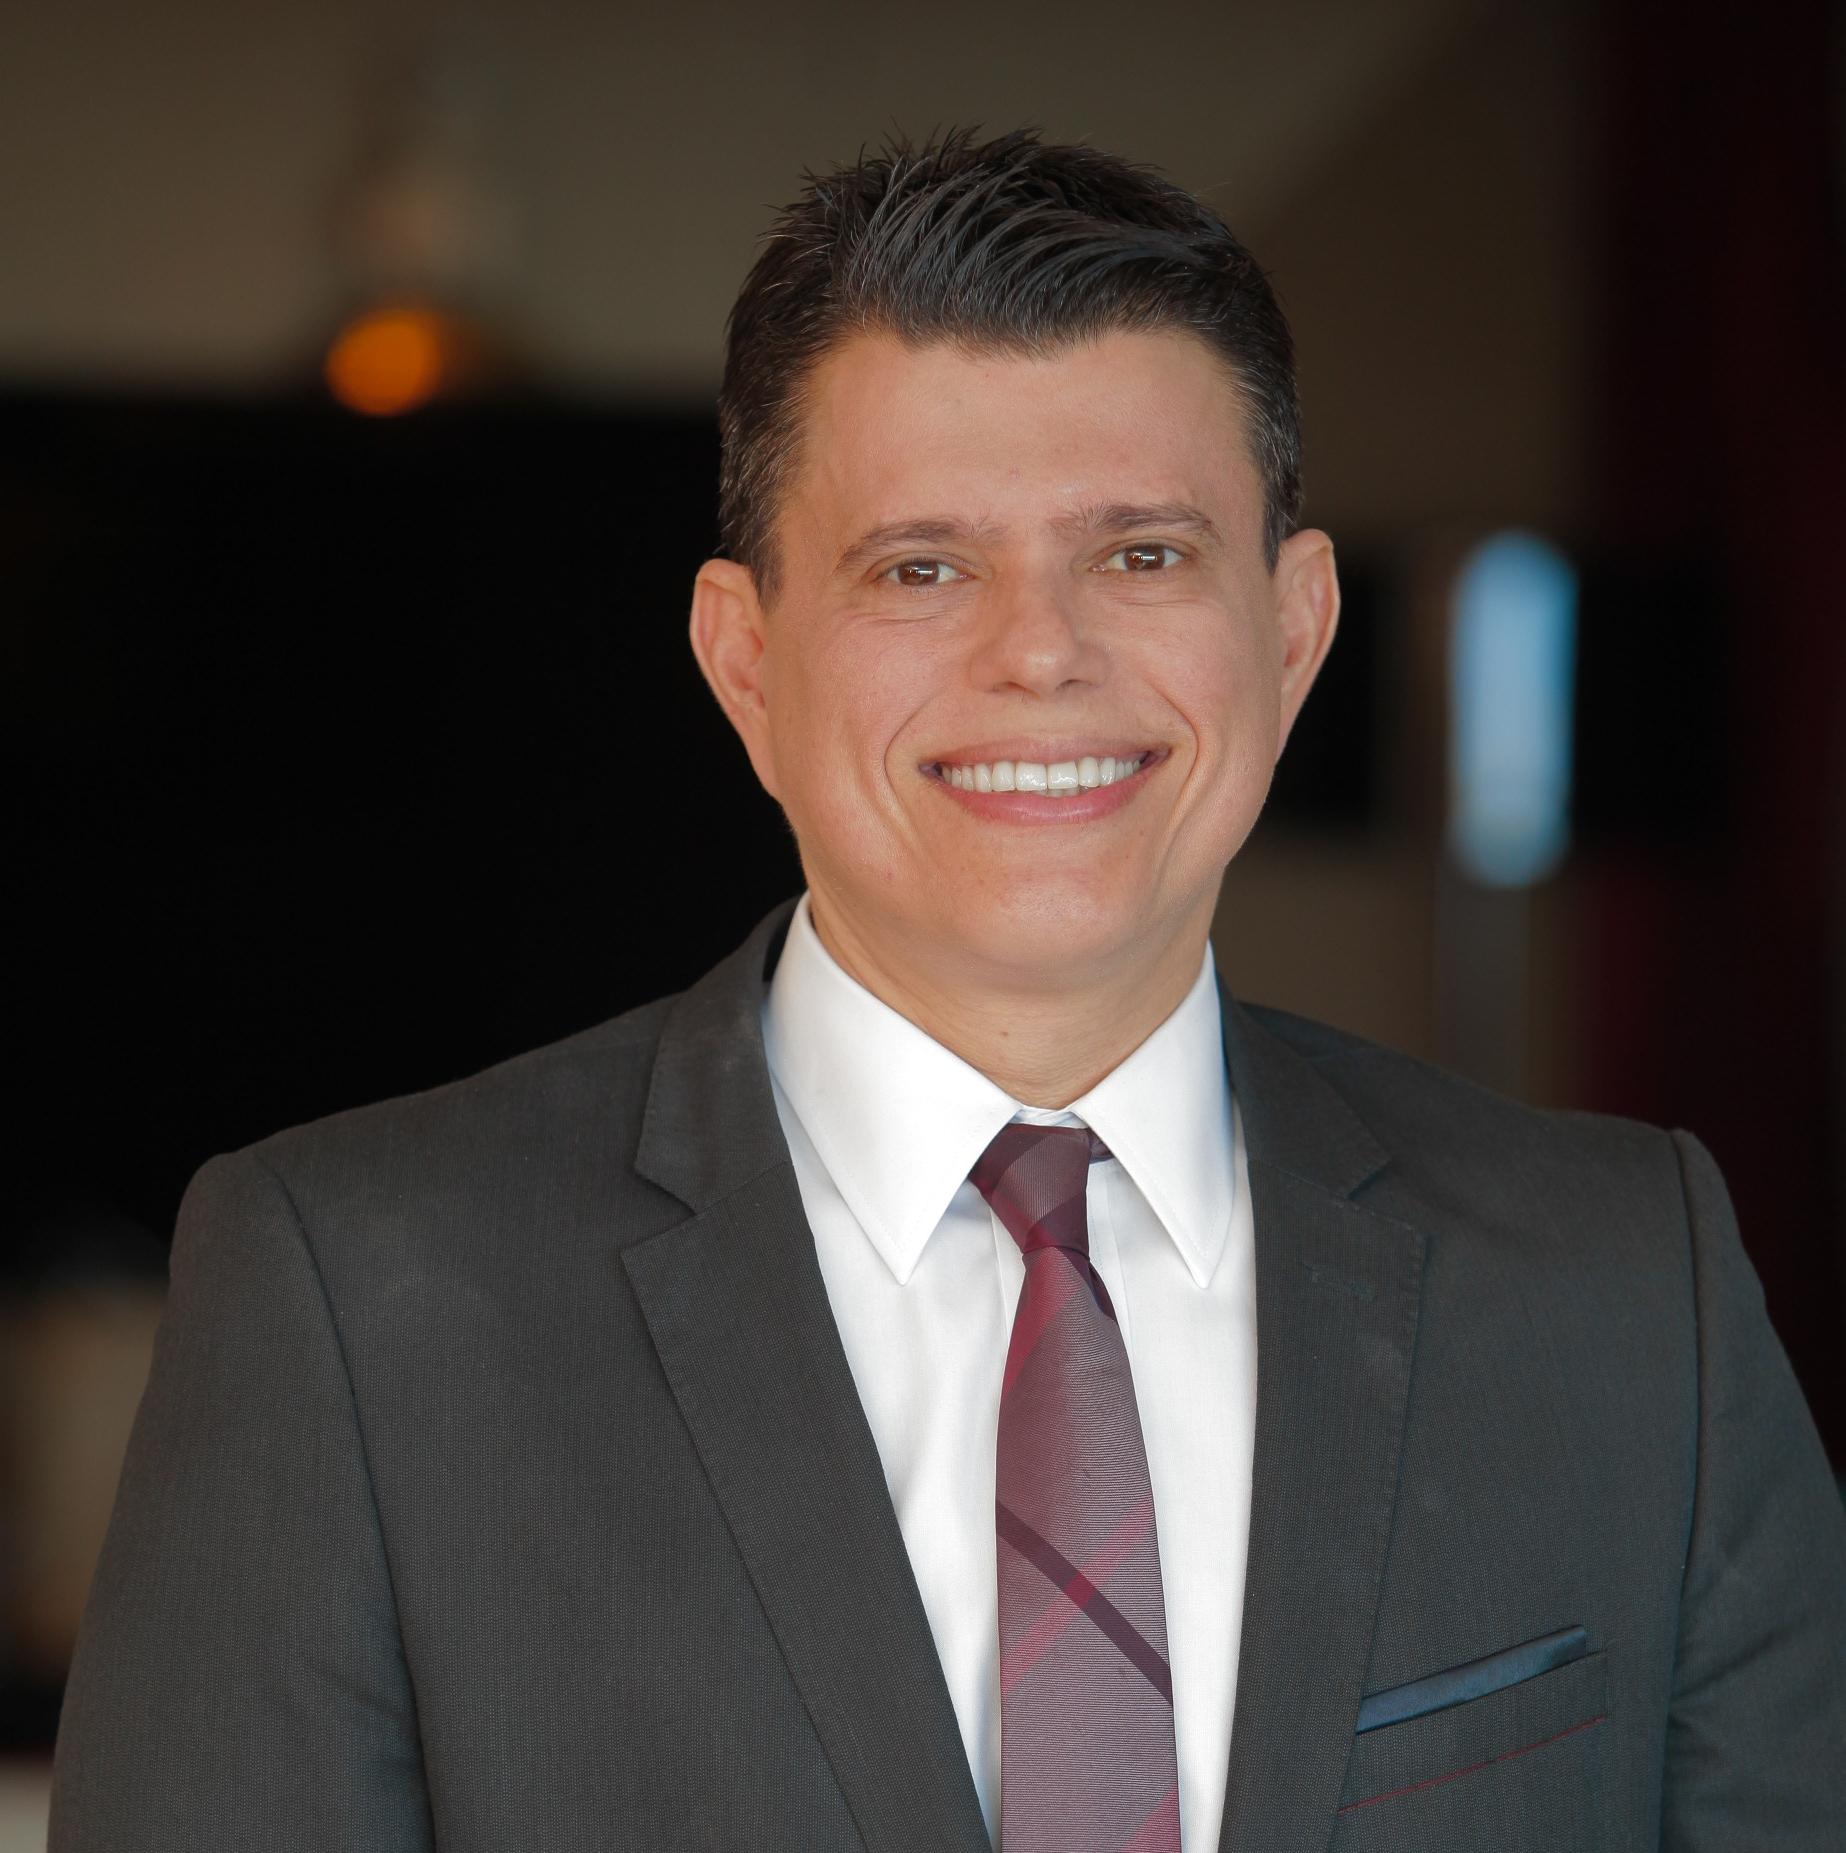 Abelardo Targino promove edição virtual do Simpósio Mácula 2020